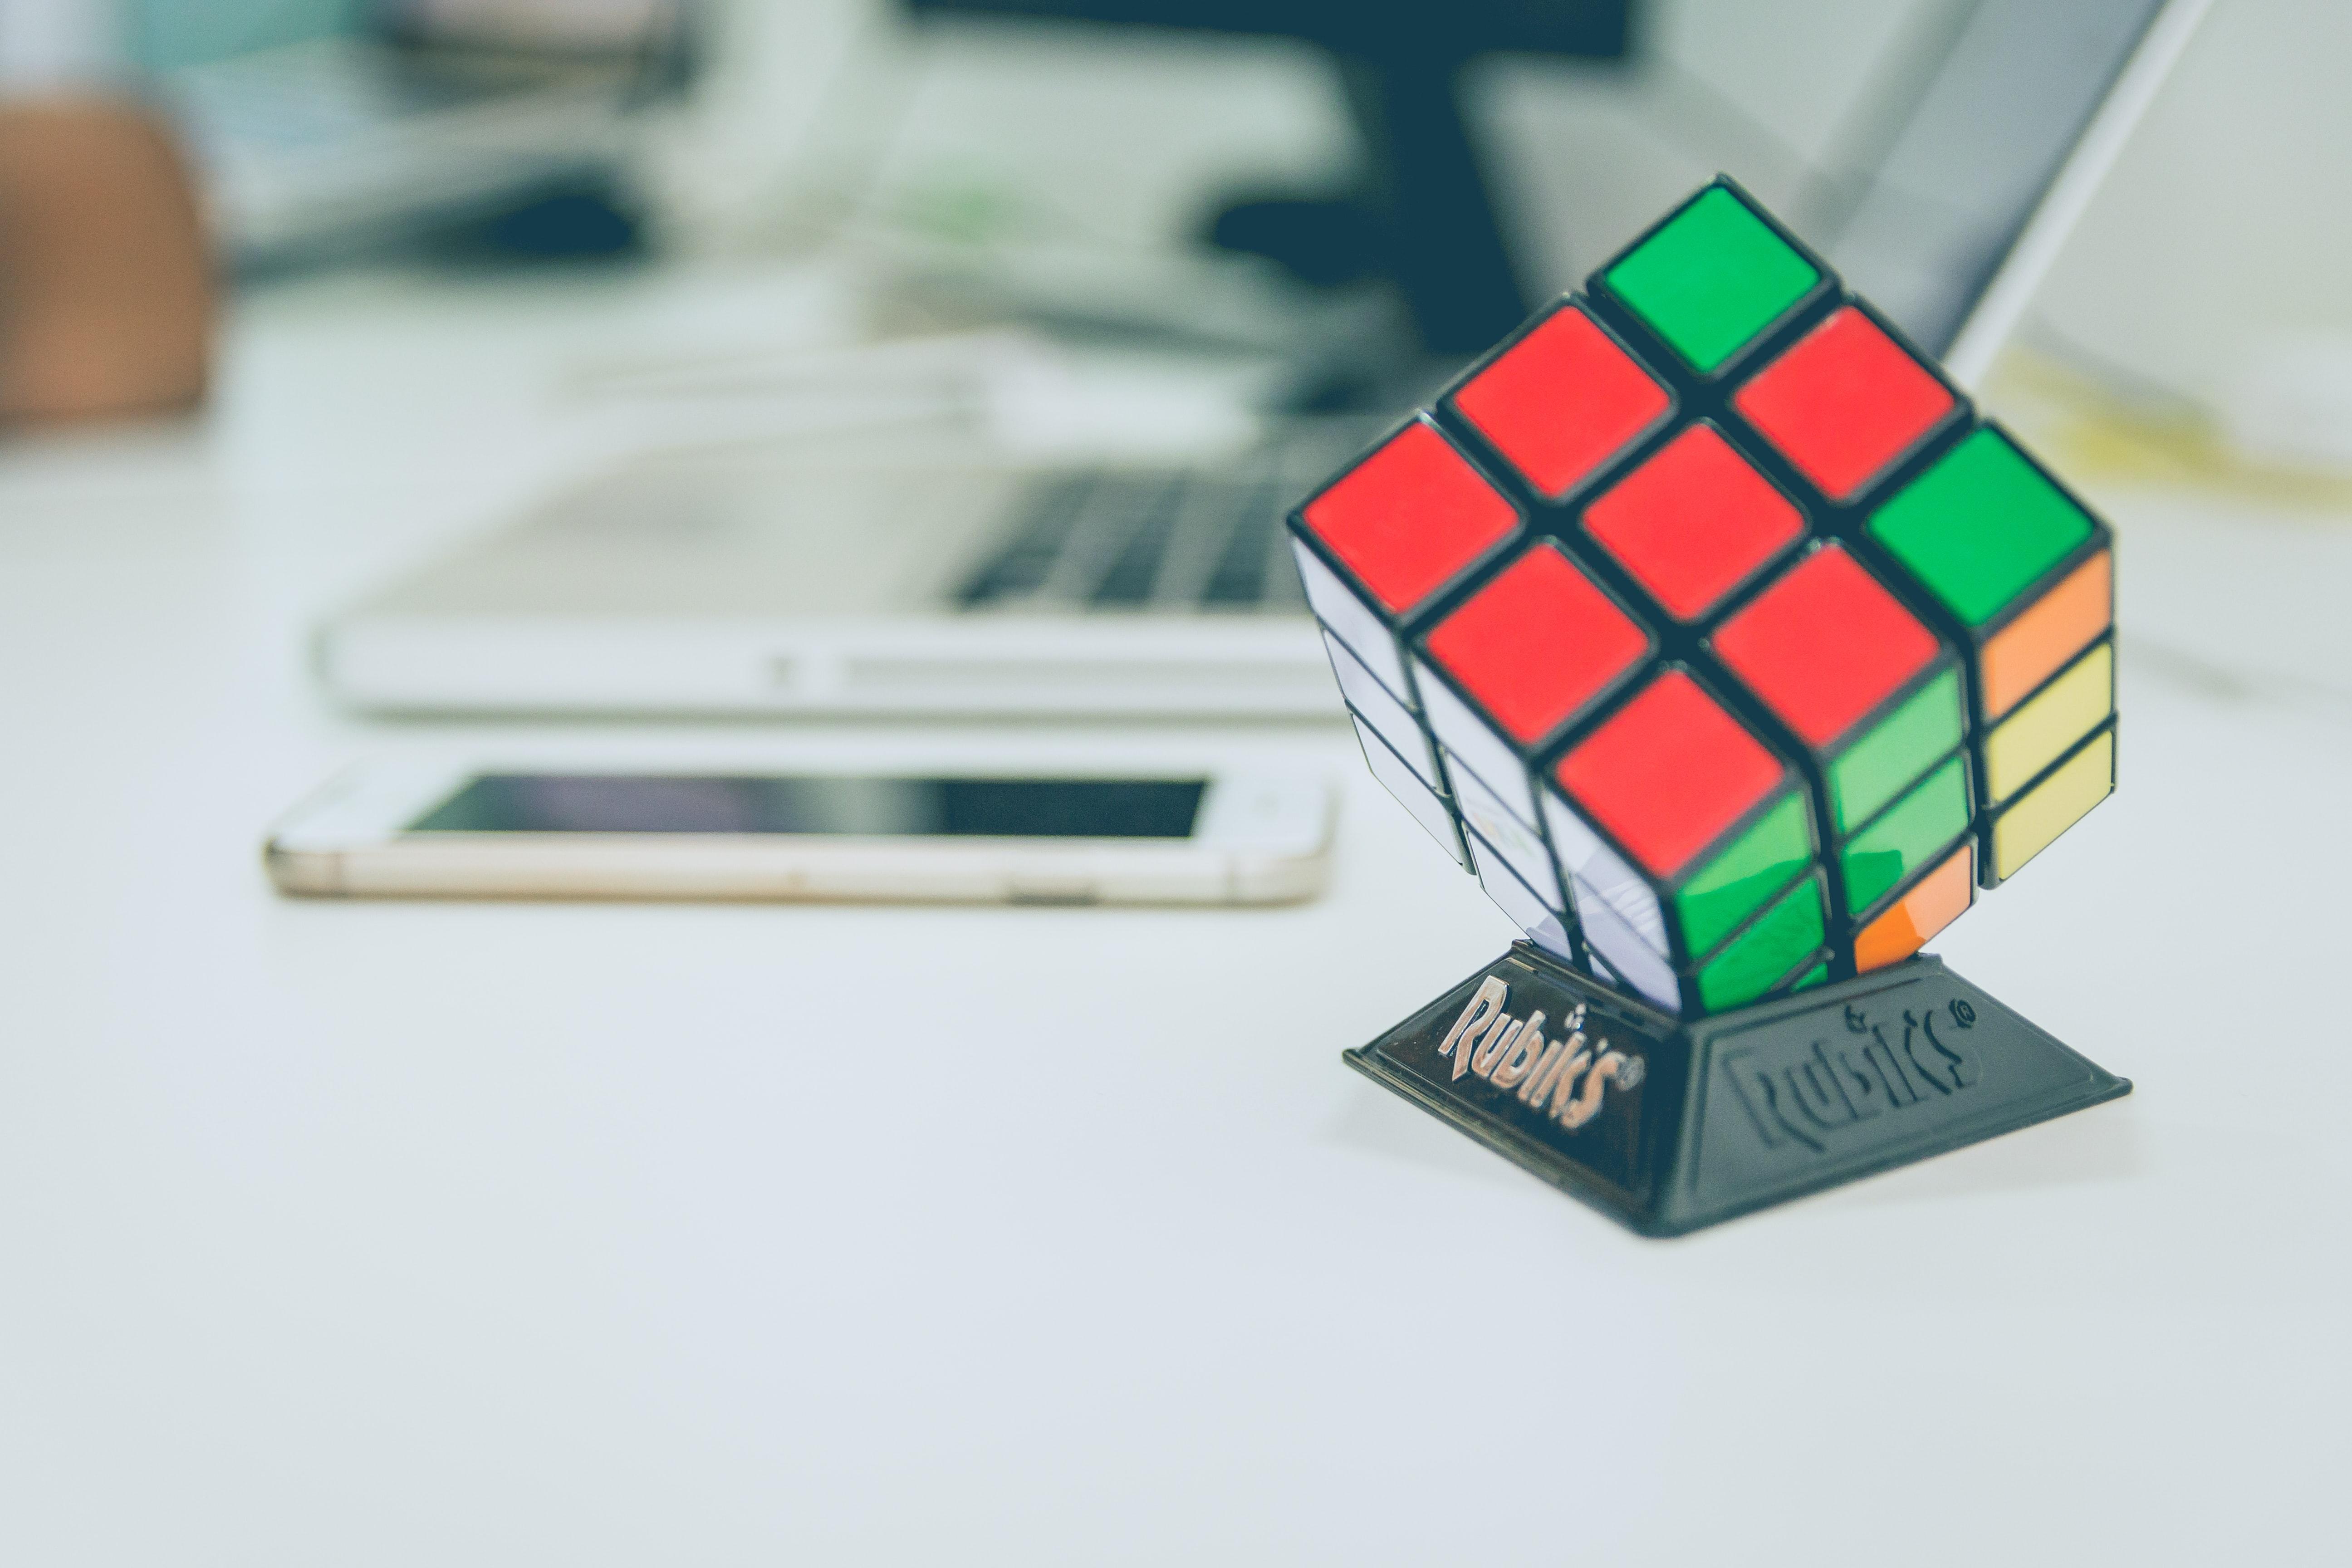 Rubix cube on white desk